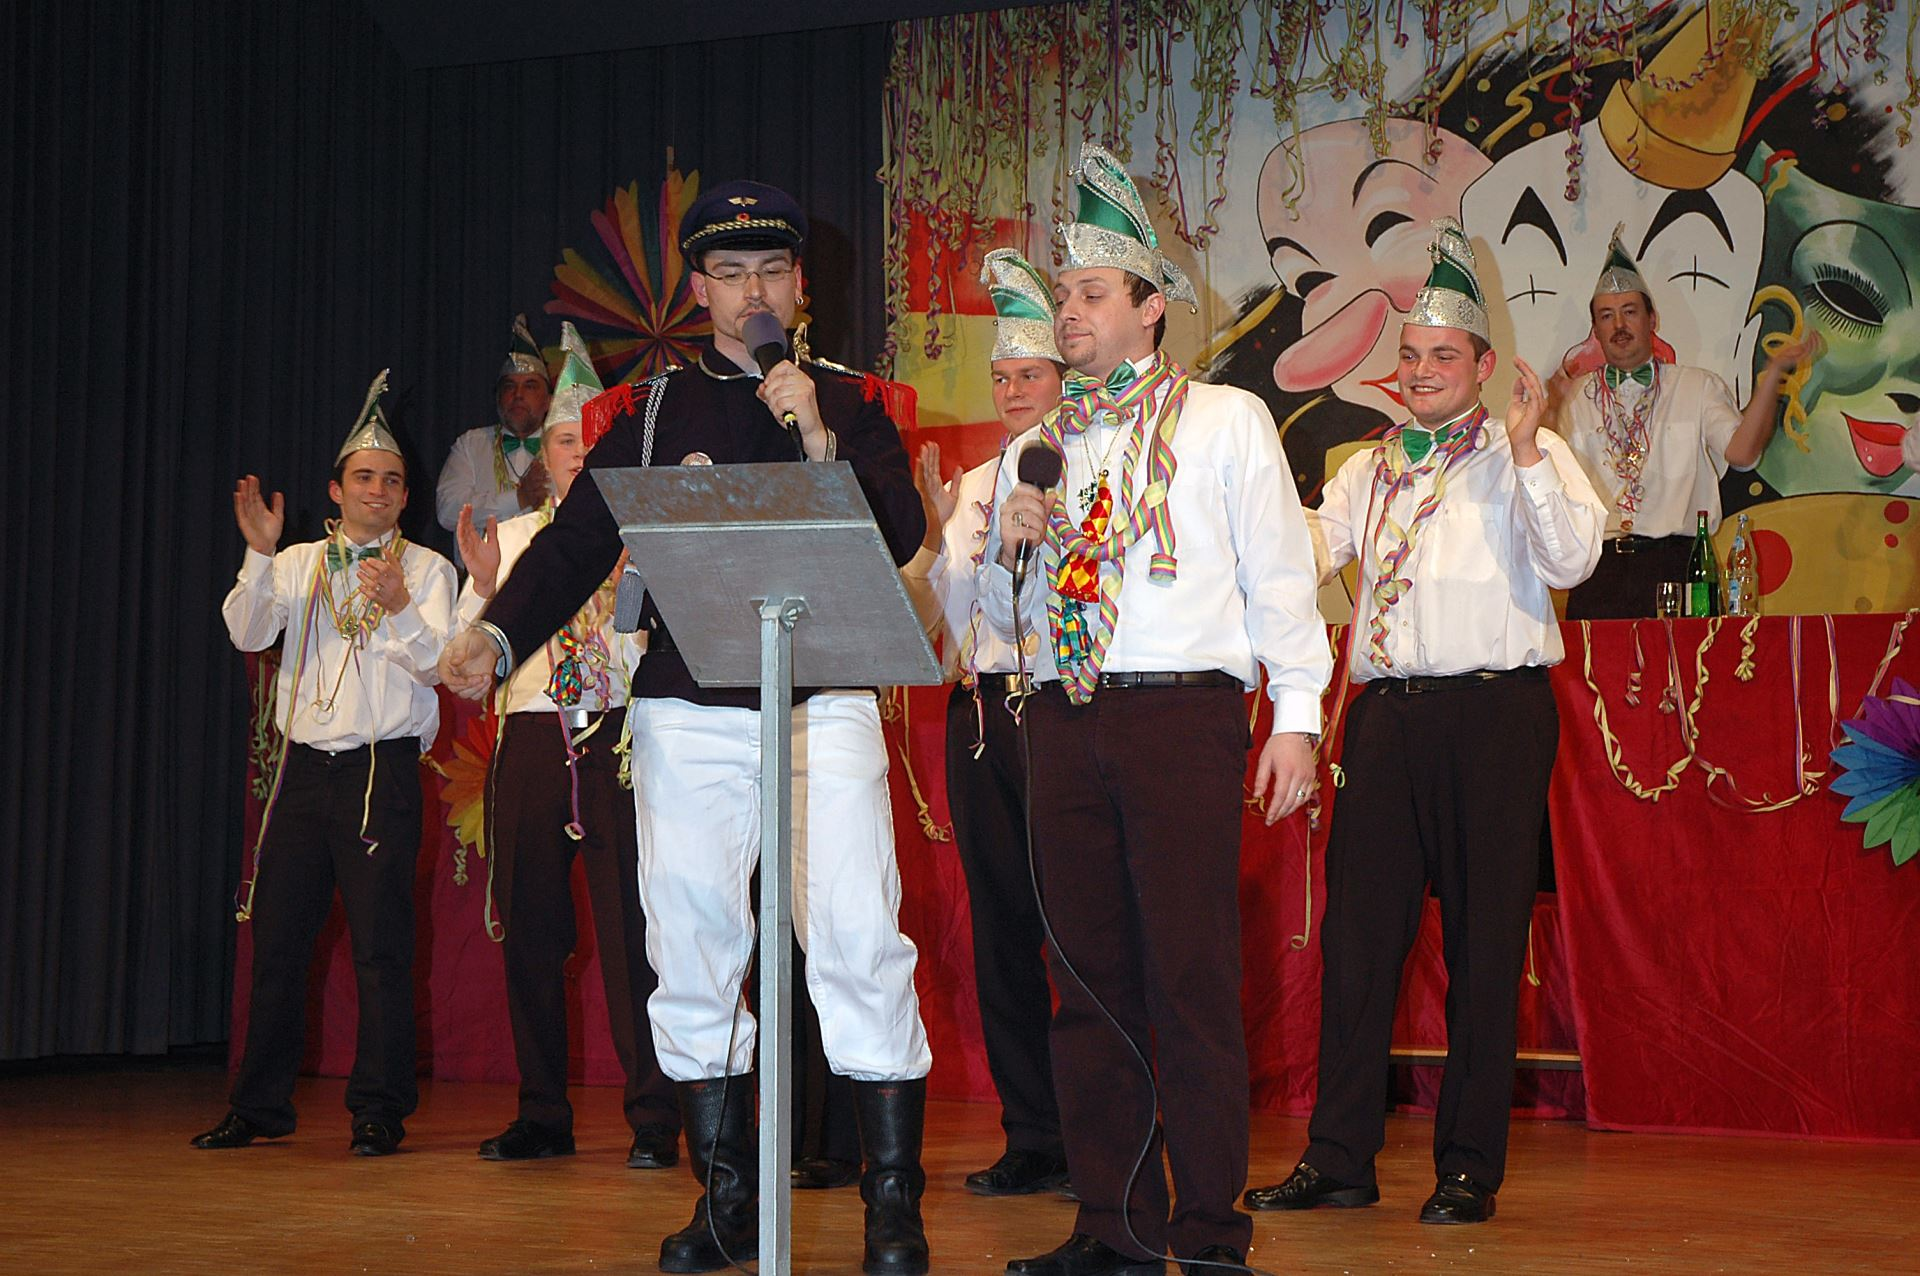 Fasentsitzung in Langenbrand 2006 (25)